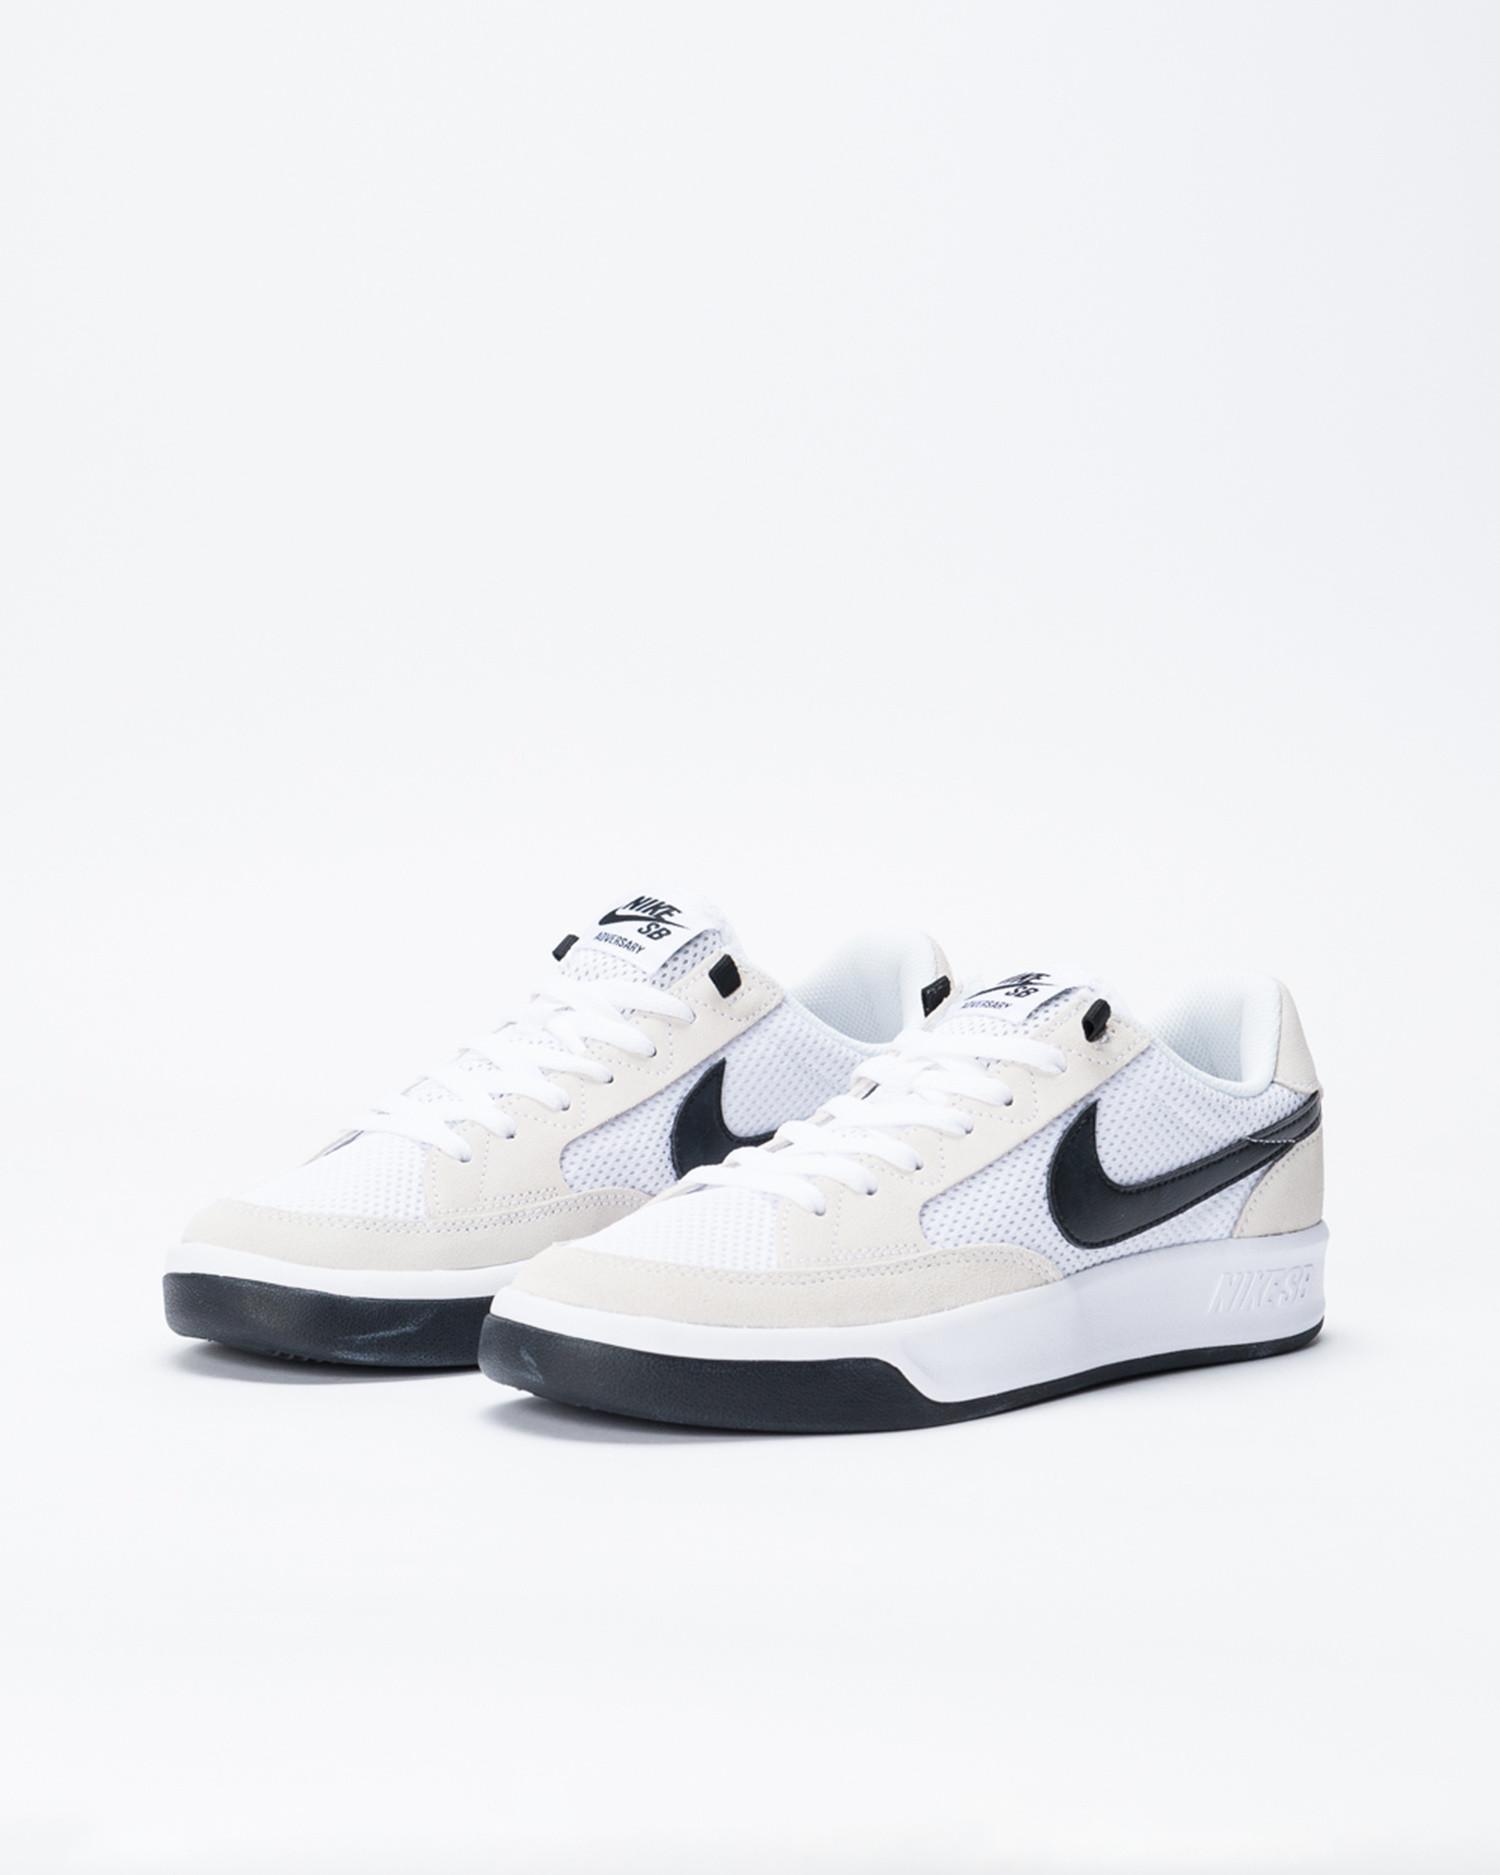 Nike SB Adversary White/Black-White